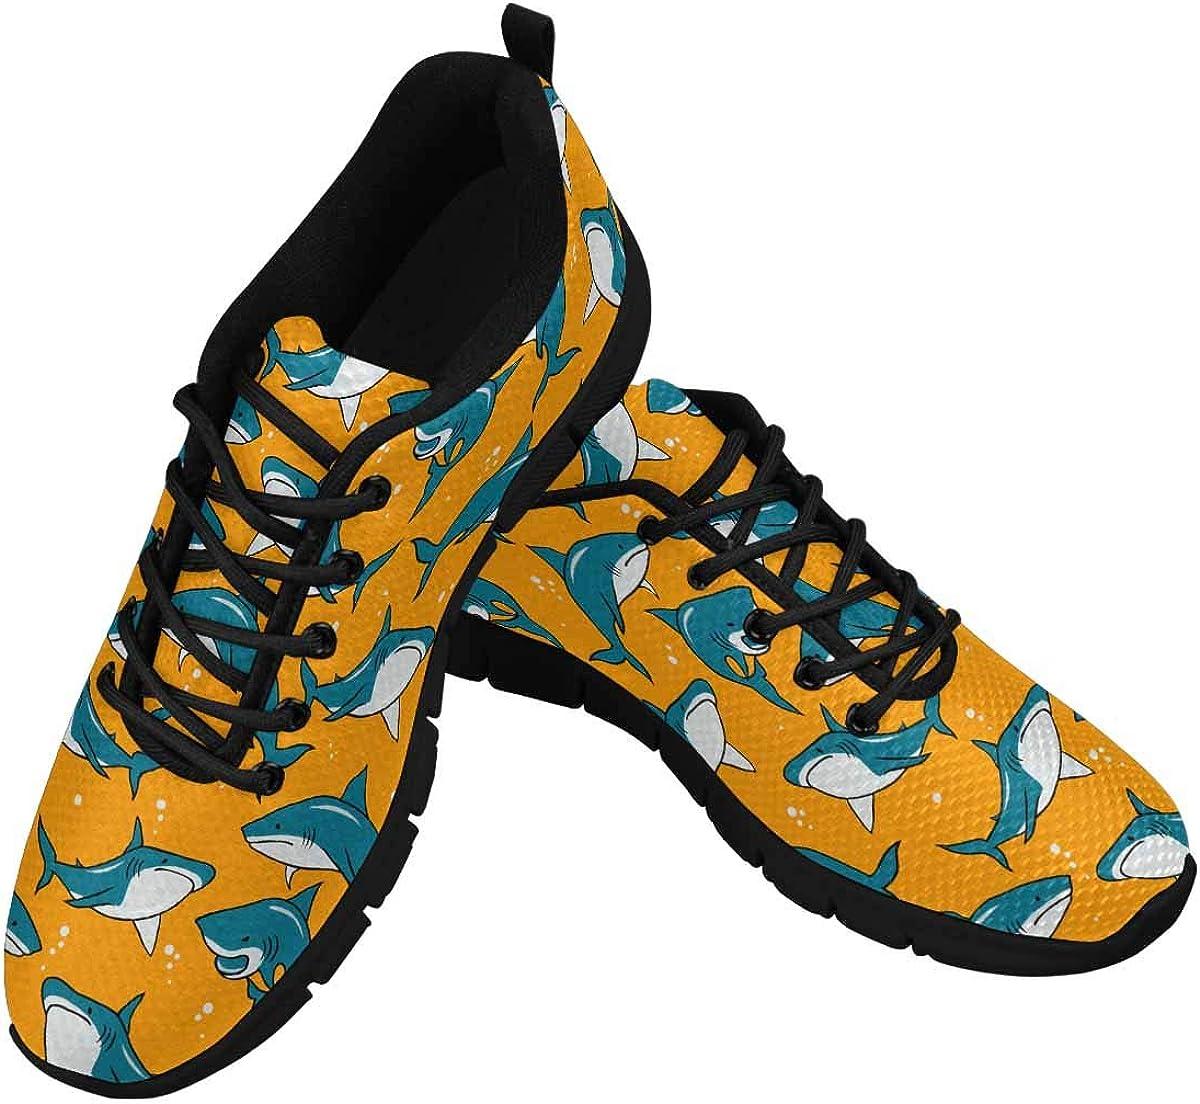 INTERESTPRINT Cartoon Sharks on Orange Background Women's Walking Shoes Lightweight Casual Running Sneakers